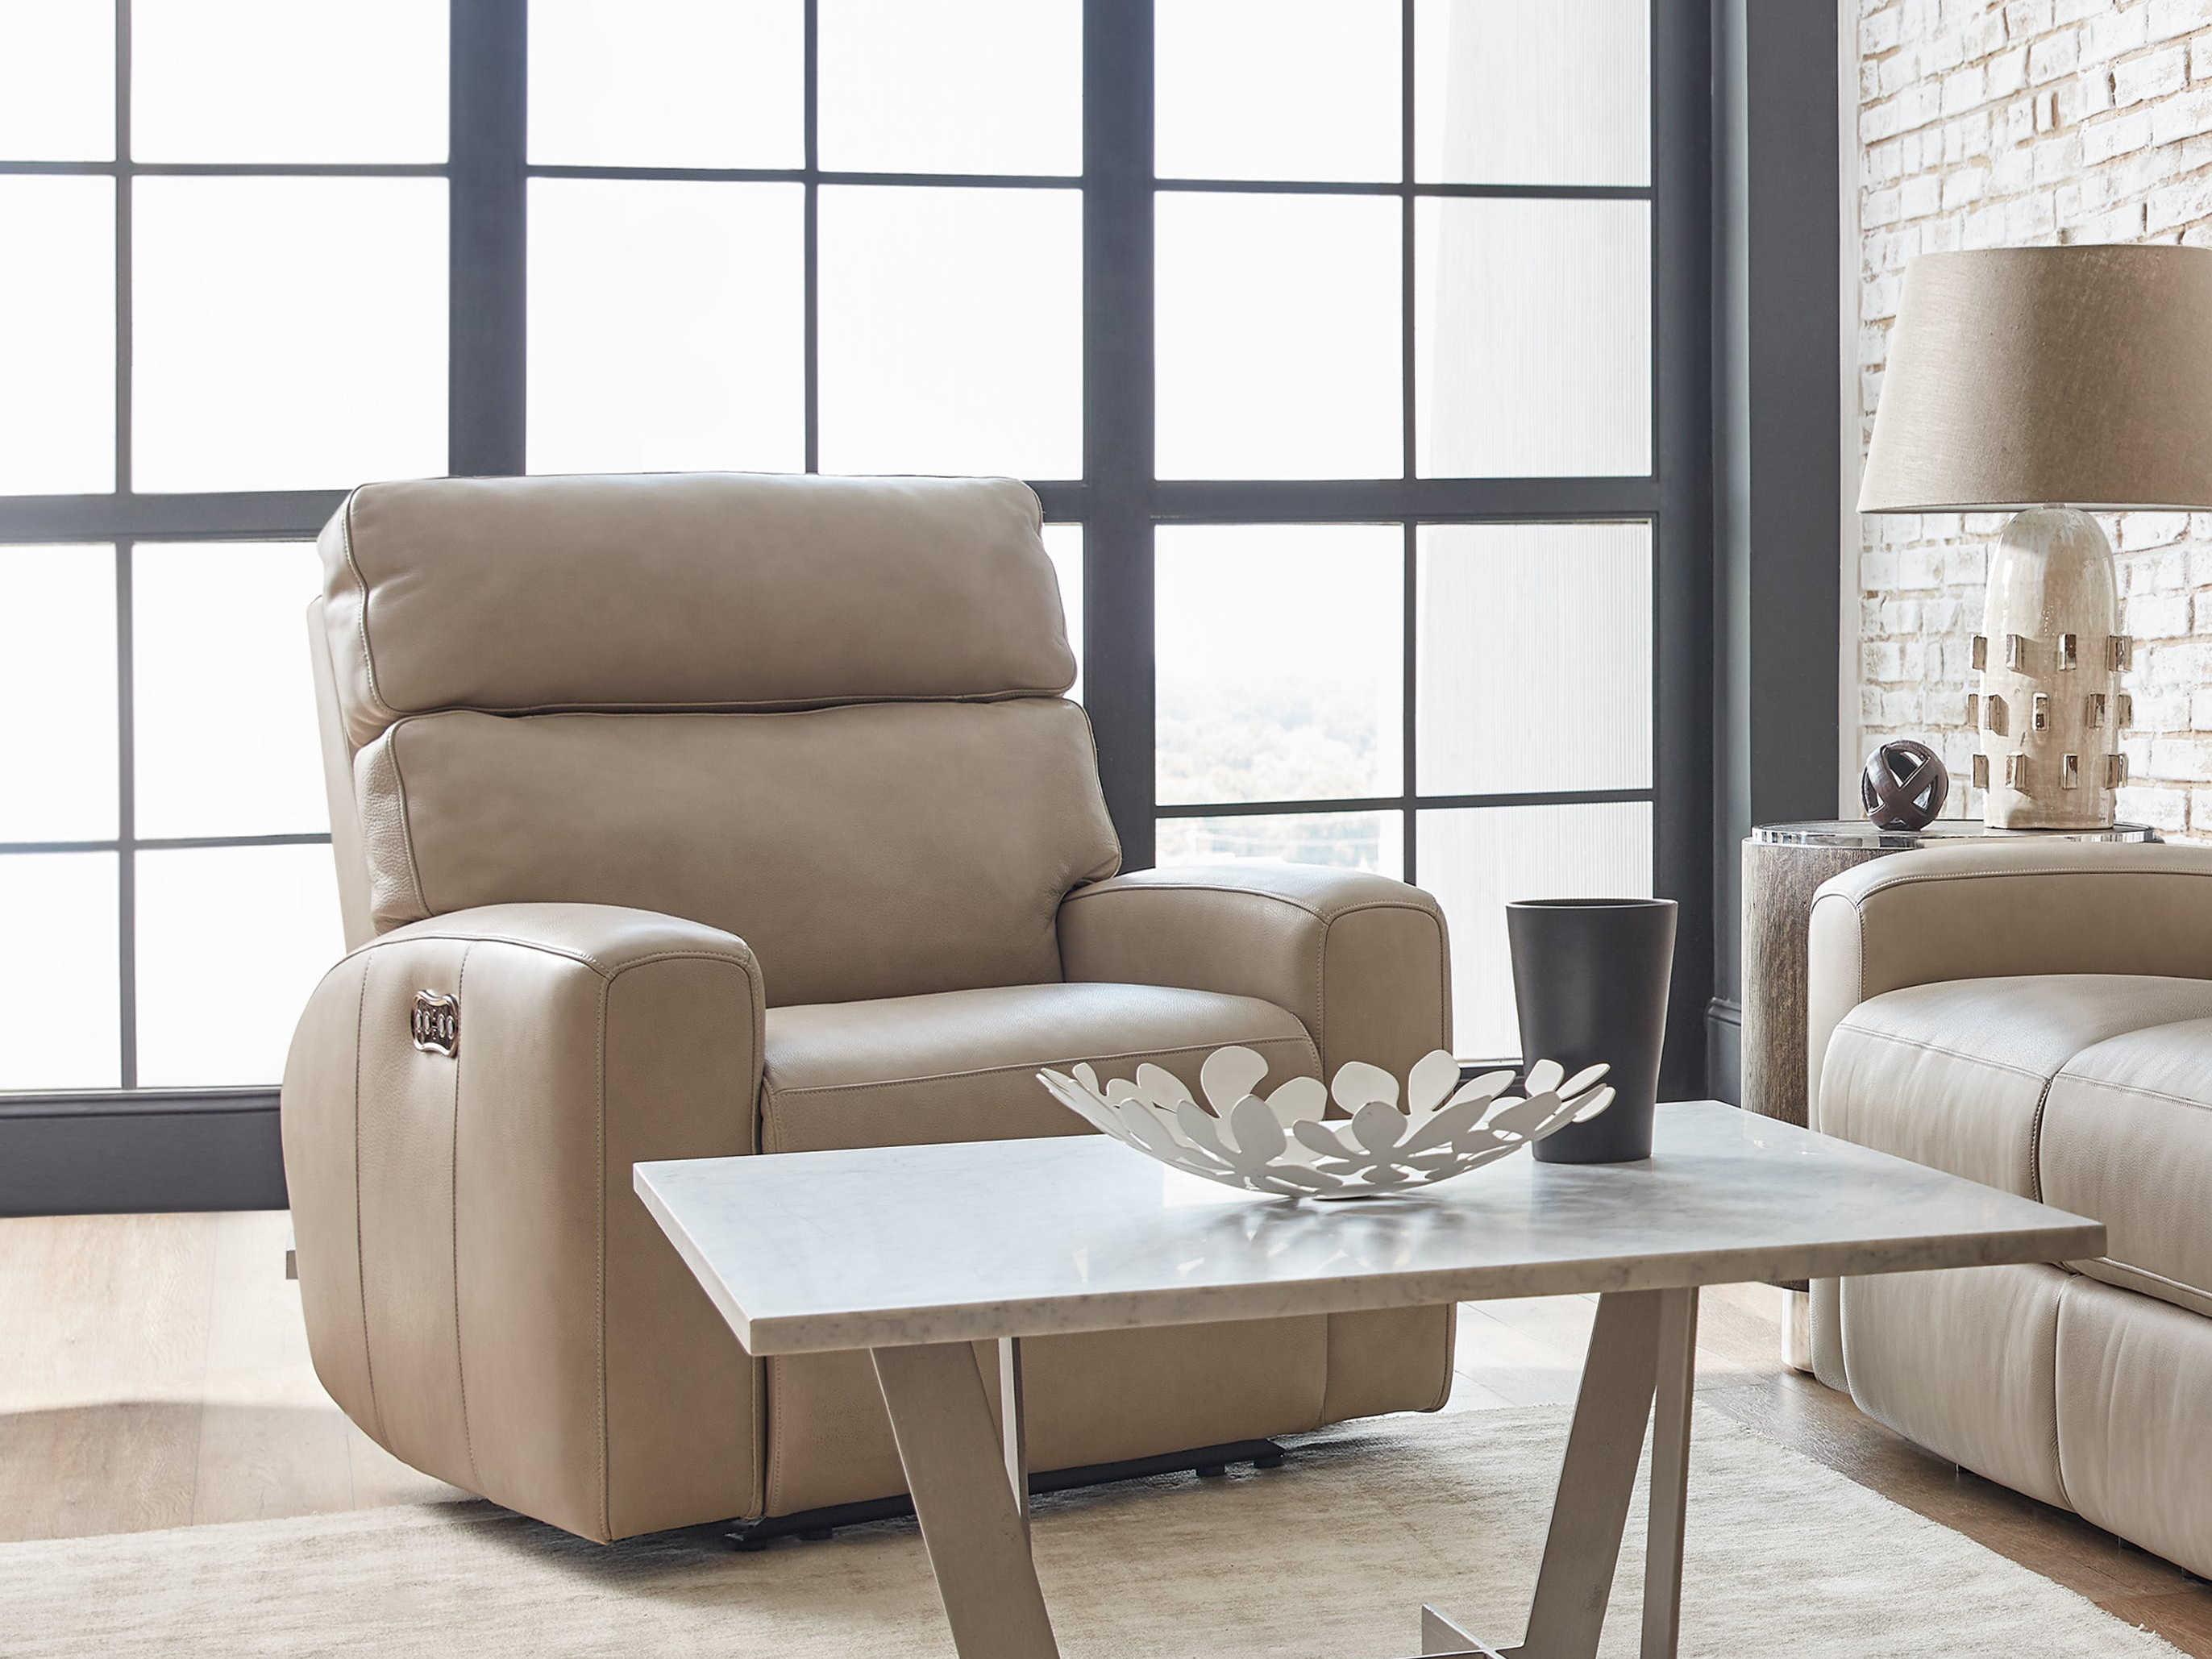 Hooker Furniture Mowry Cream Power Motion Recliner With Power Headrest